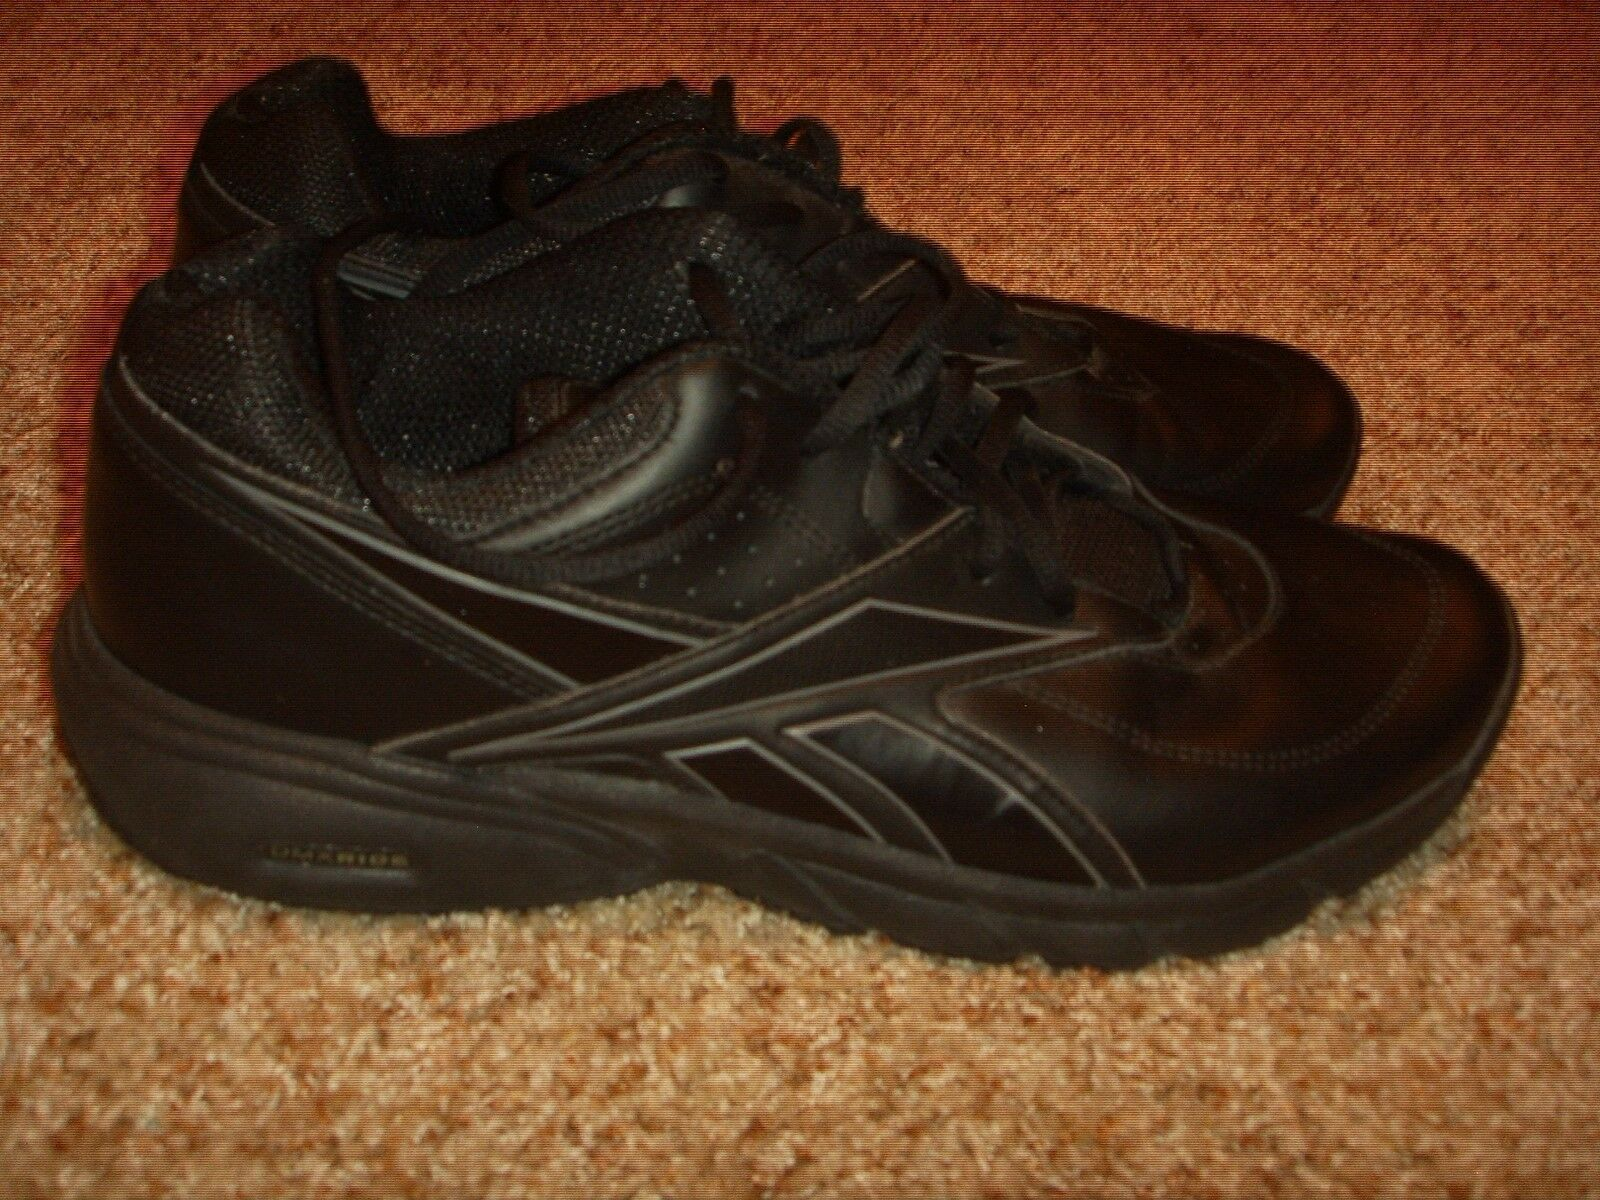 Reebok Walking DMX Ride Black Leather Mens Size 11.5